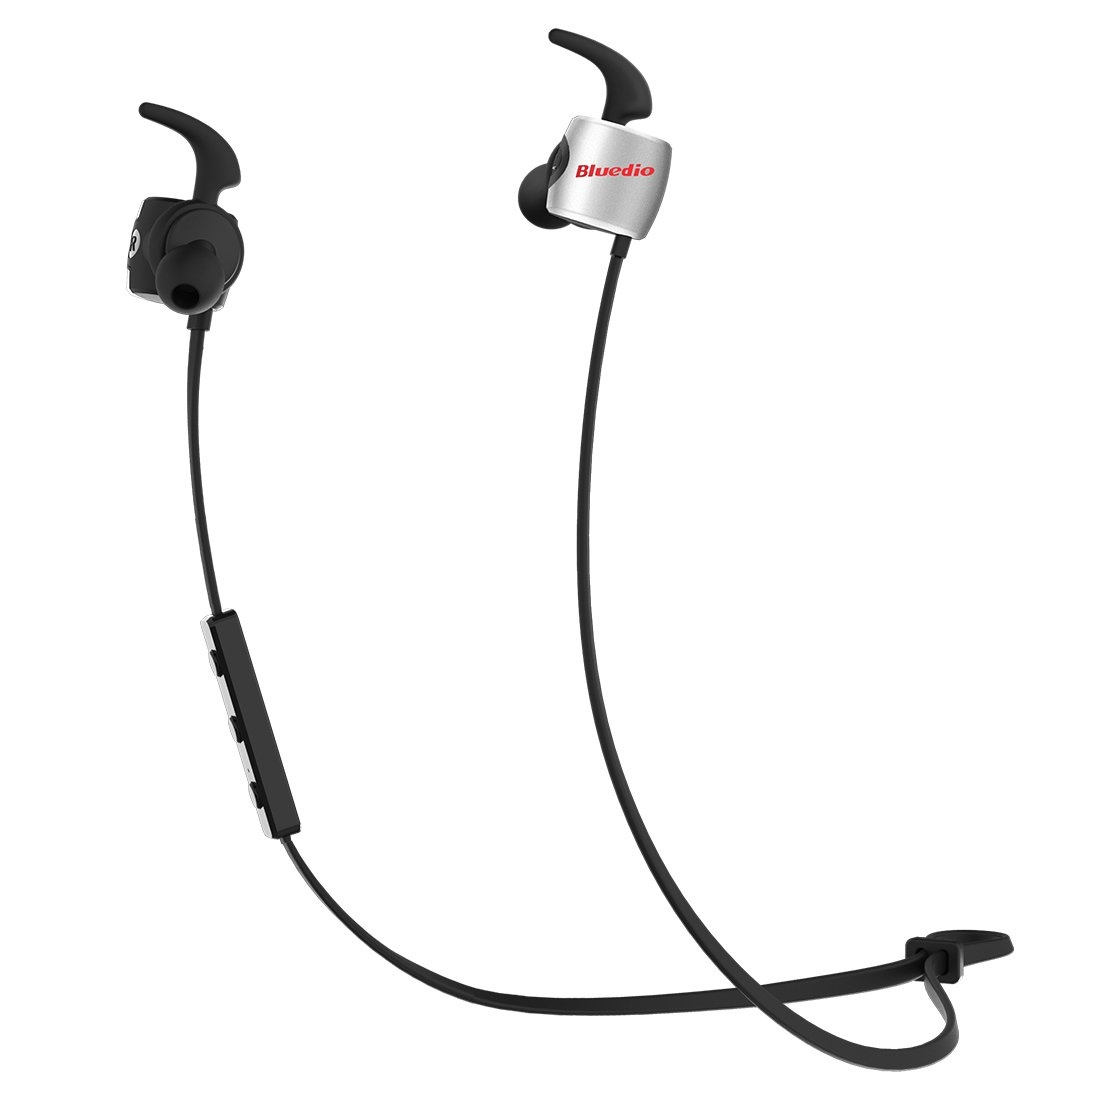 Bluedio TE (Turbine) Bluetooth 4.1 draadloze sporthoofdtelefoon, zweetbestendige hardloopoordopjes met microfoon (zwart)